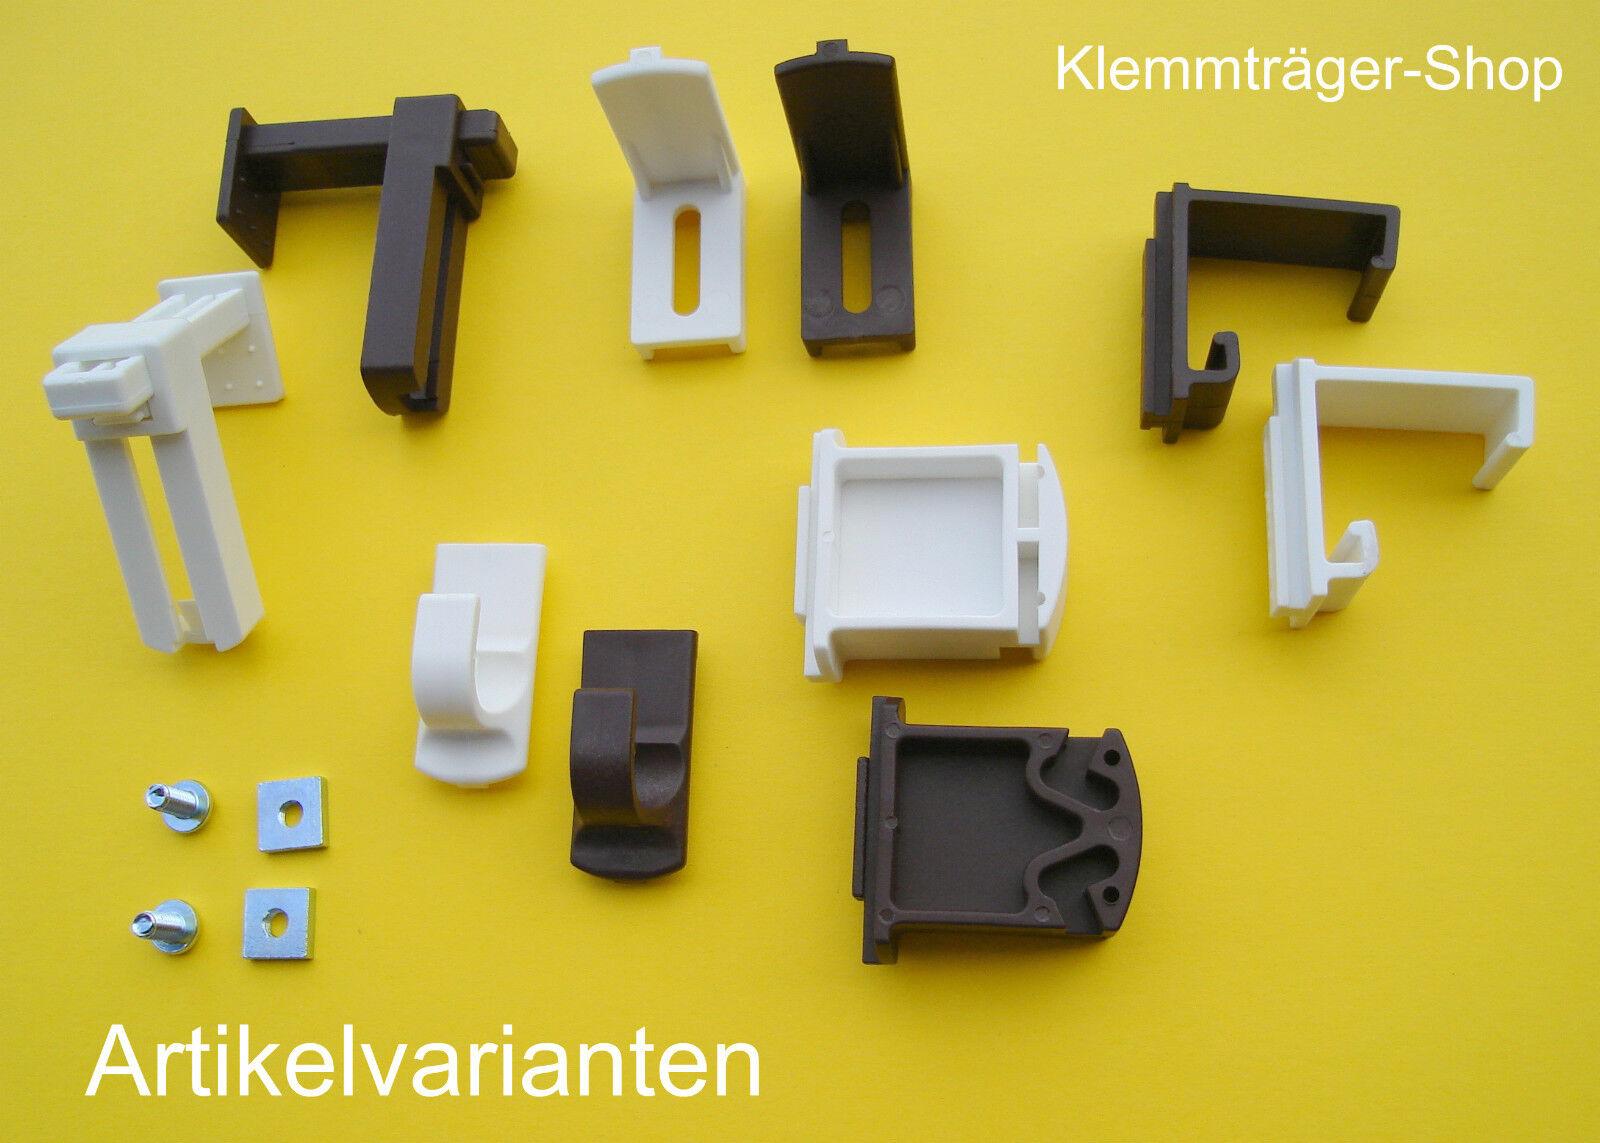 klemmhalterung f r scheibengardinen halterung f r gardinenstangen klemmtr ger eur 5 95. Black Bedroom Furniture Sets. Home Design Ideas